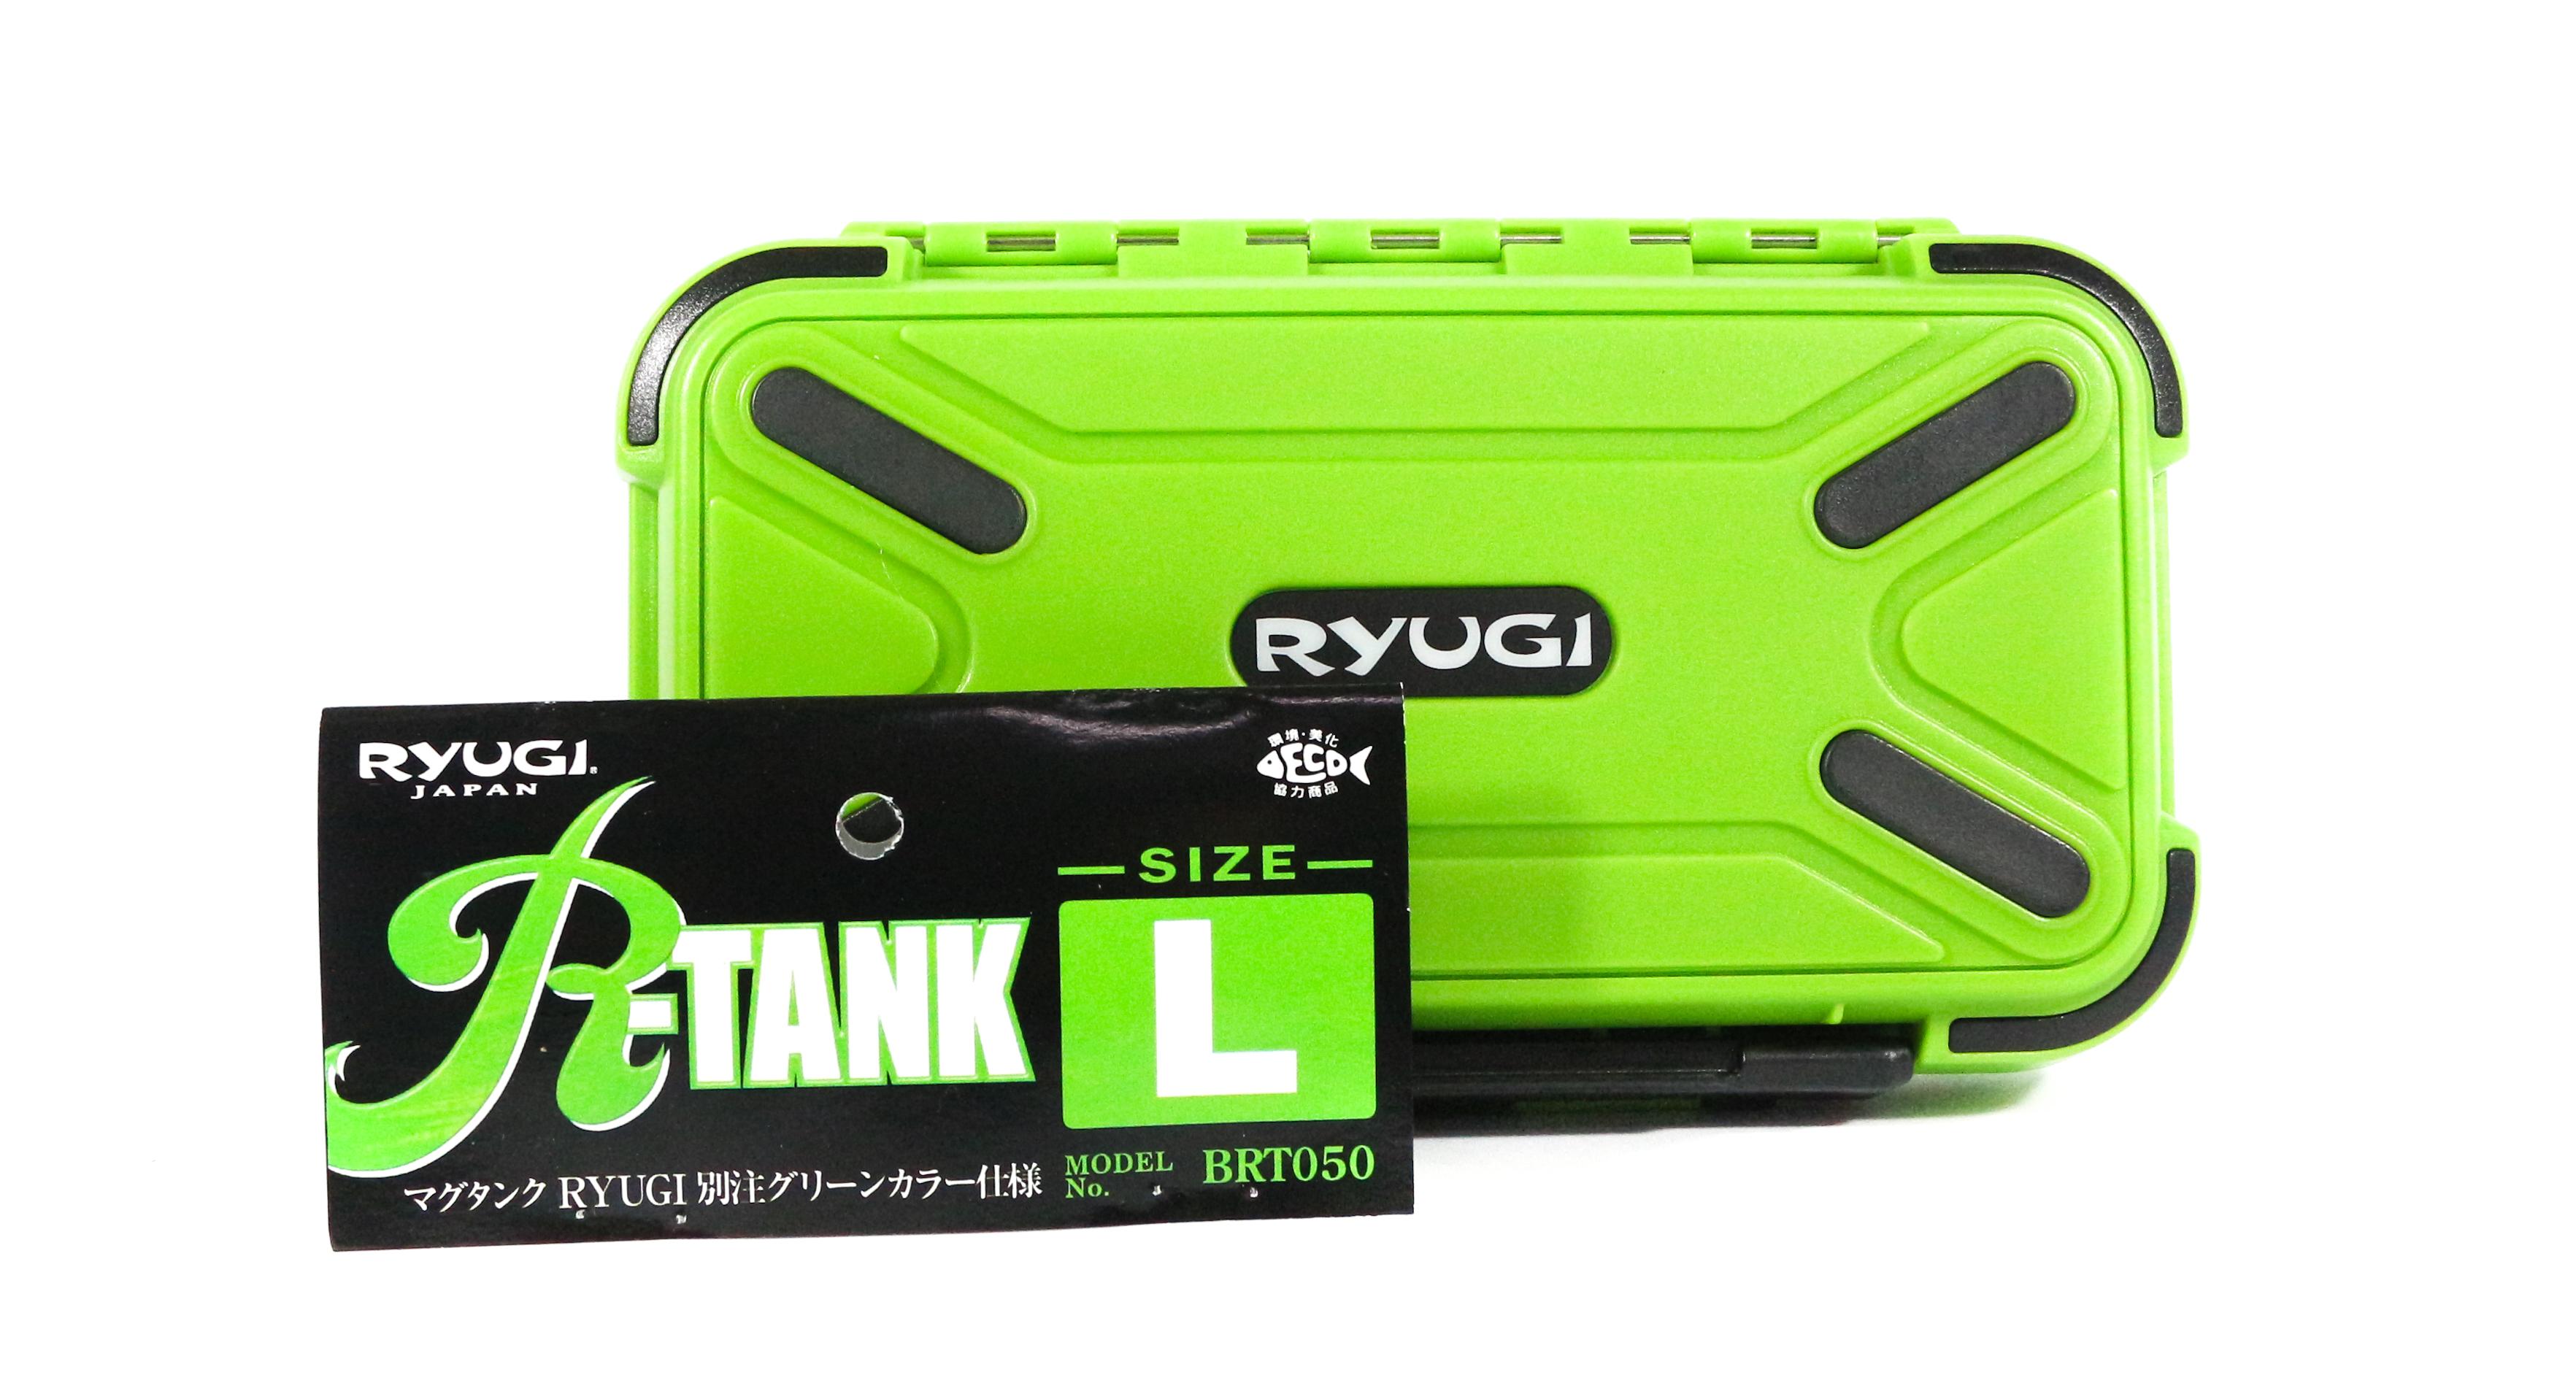 Ryugi BRT050 R Tank Case Tackle Box Size L (2458)